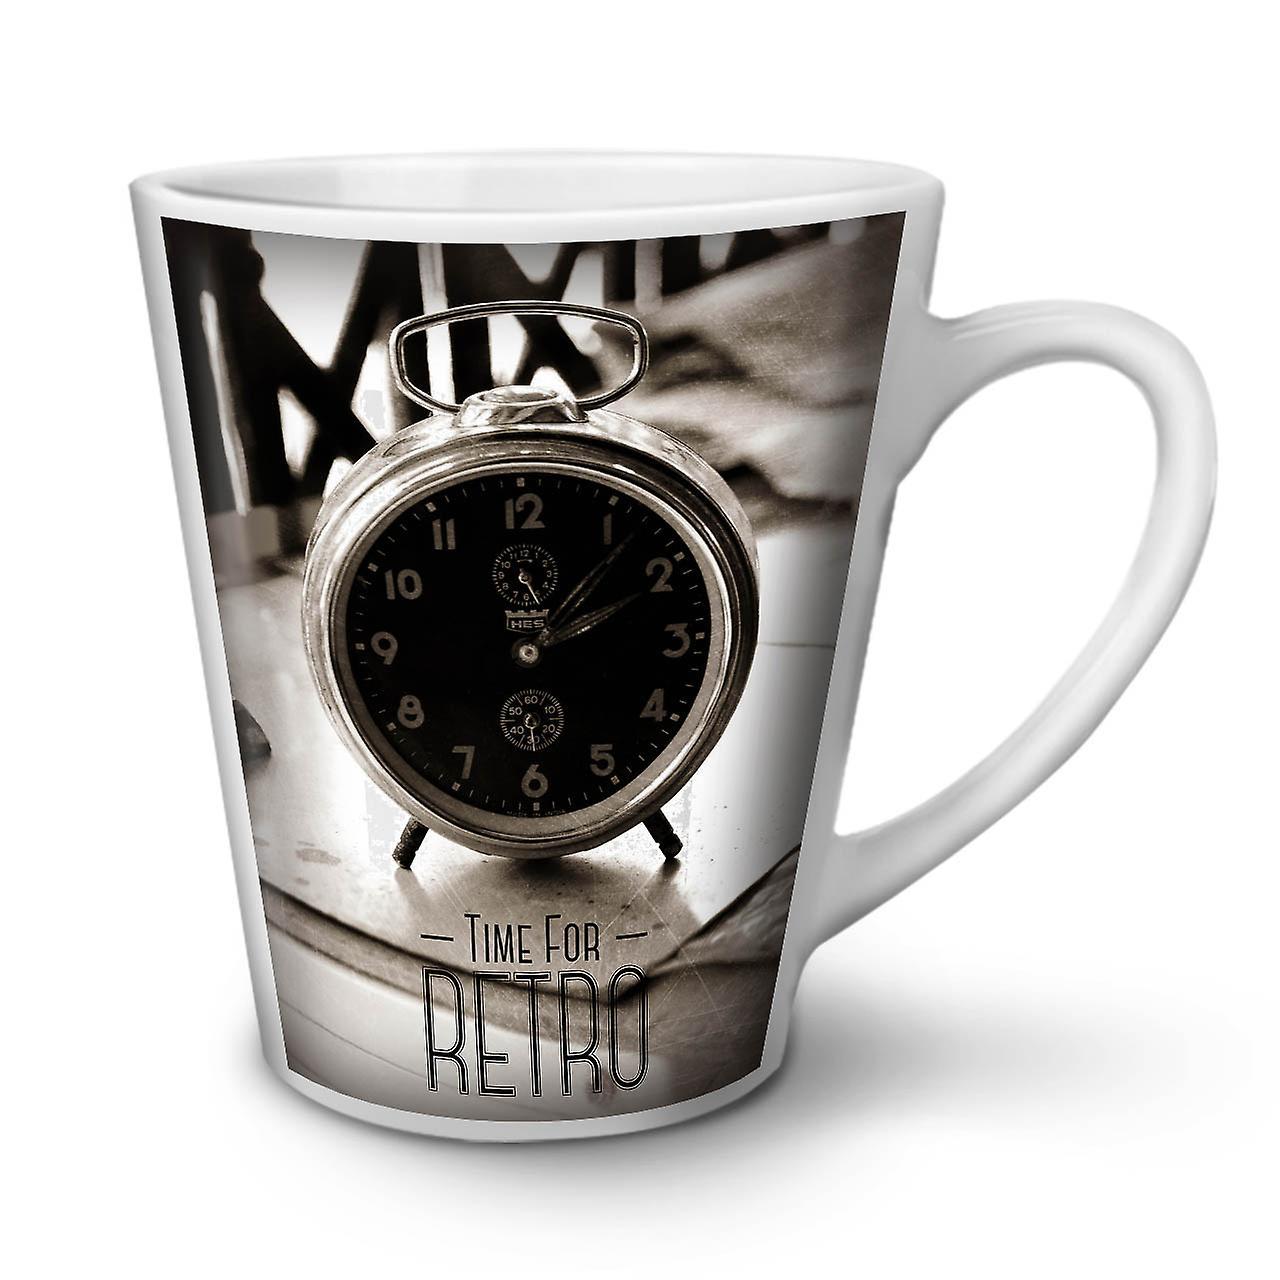 OzWellcoda Latte Céramique Café Blanche Horloge Tasse 12 Photo Nouvelle En Rétro ybvIYf76g